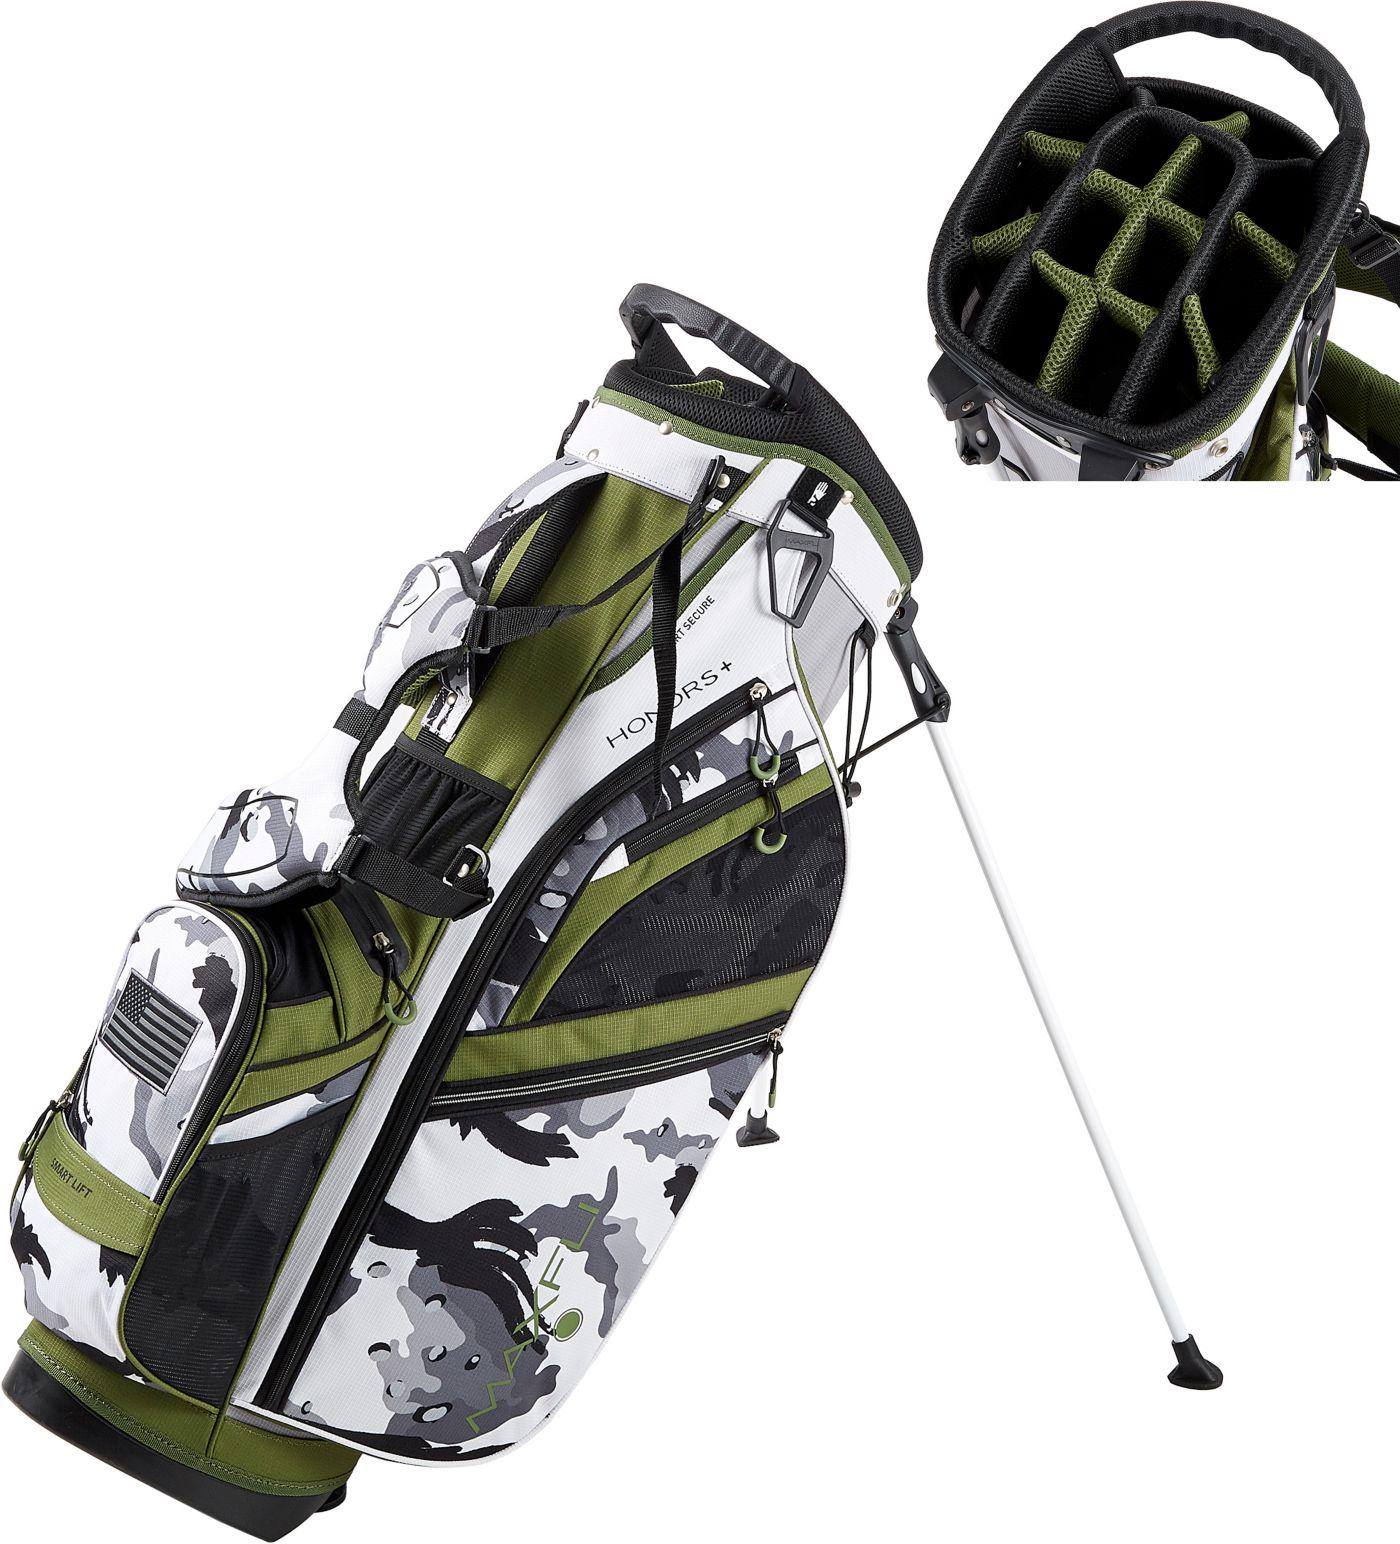 Maxfli 2019 Honors Plus Golf Stand Bag